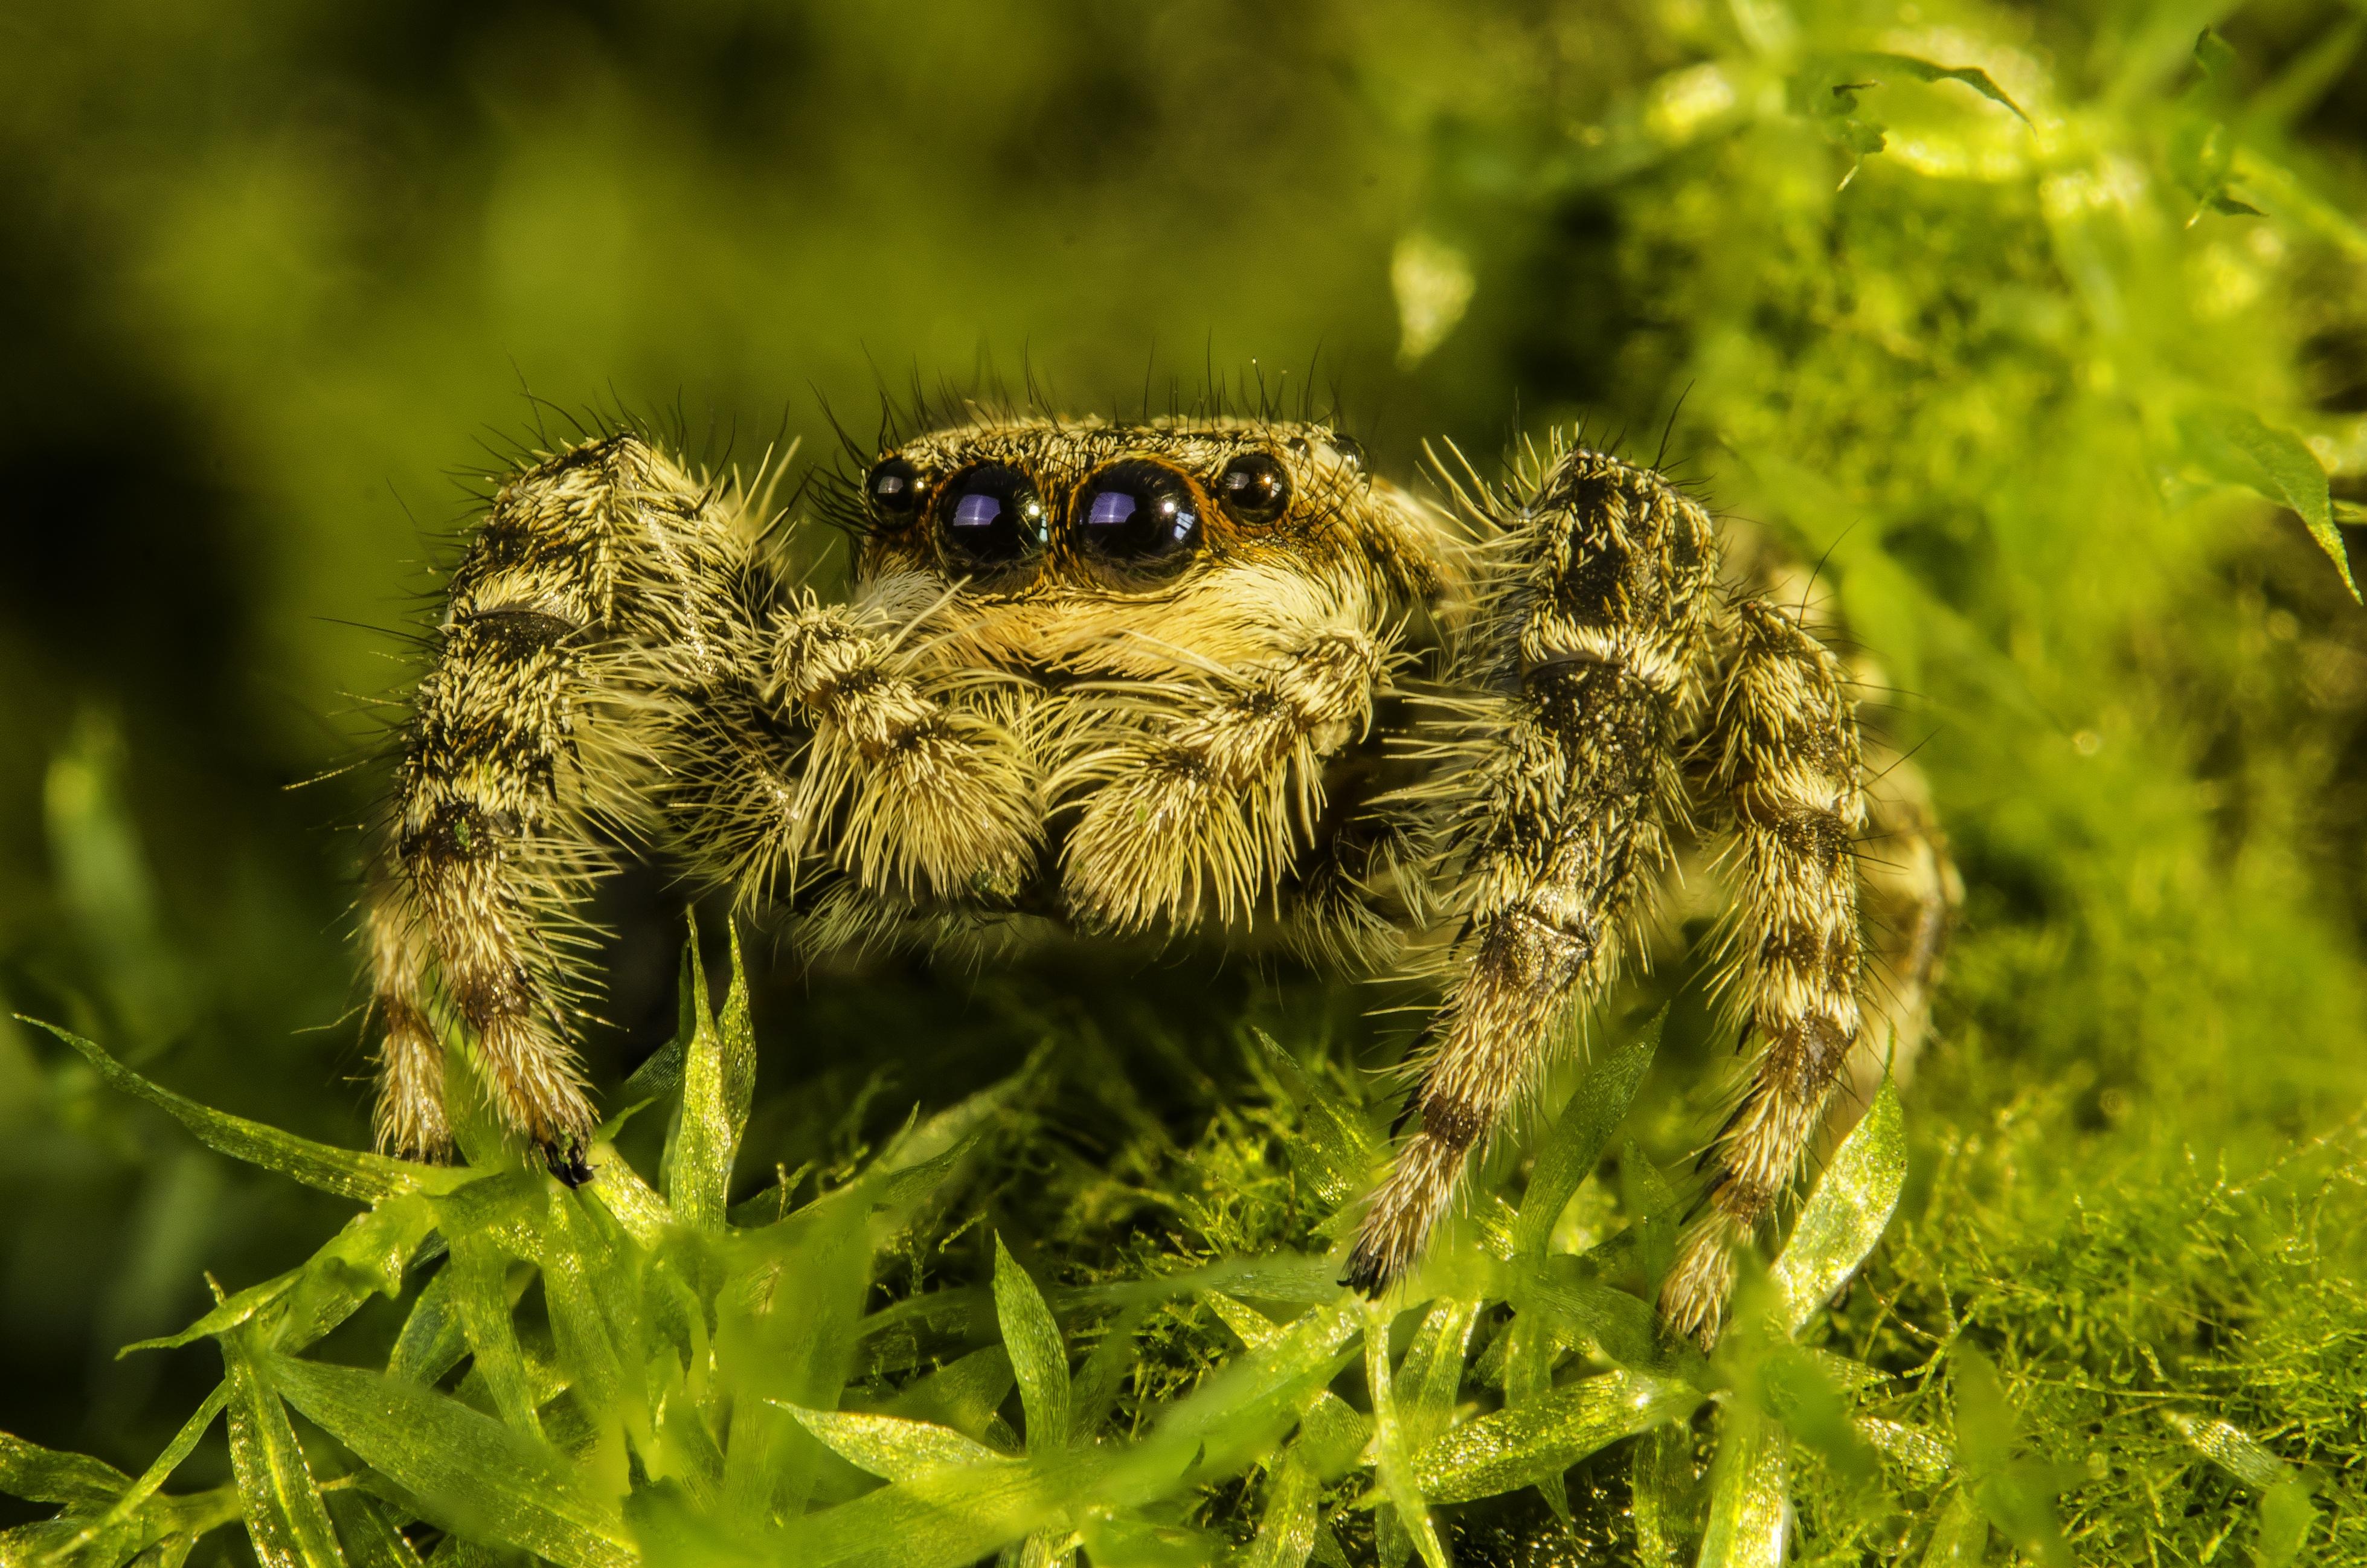 Cute Wallpaper Download Free Stock Photo Of Arachnid Close Up Macro